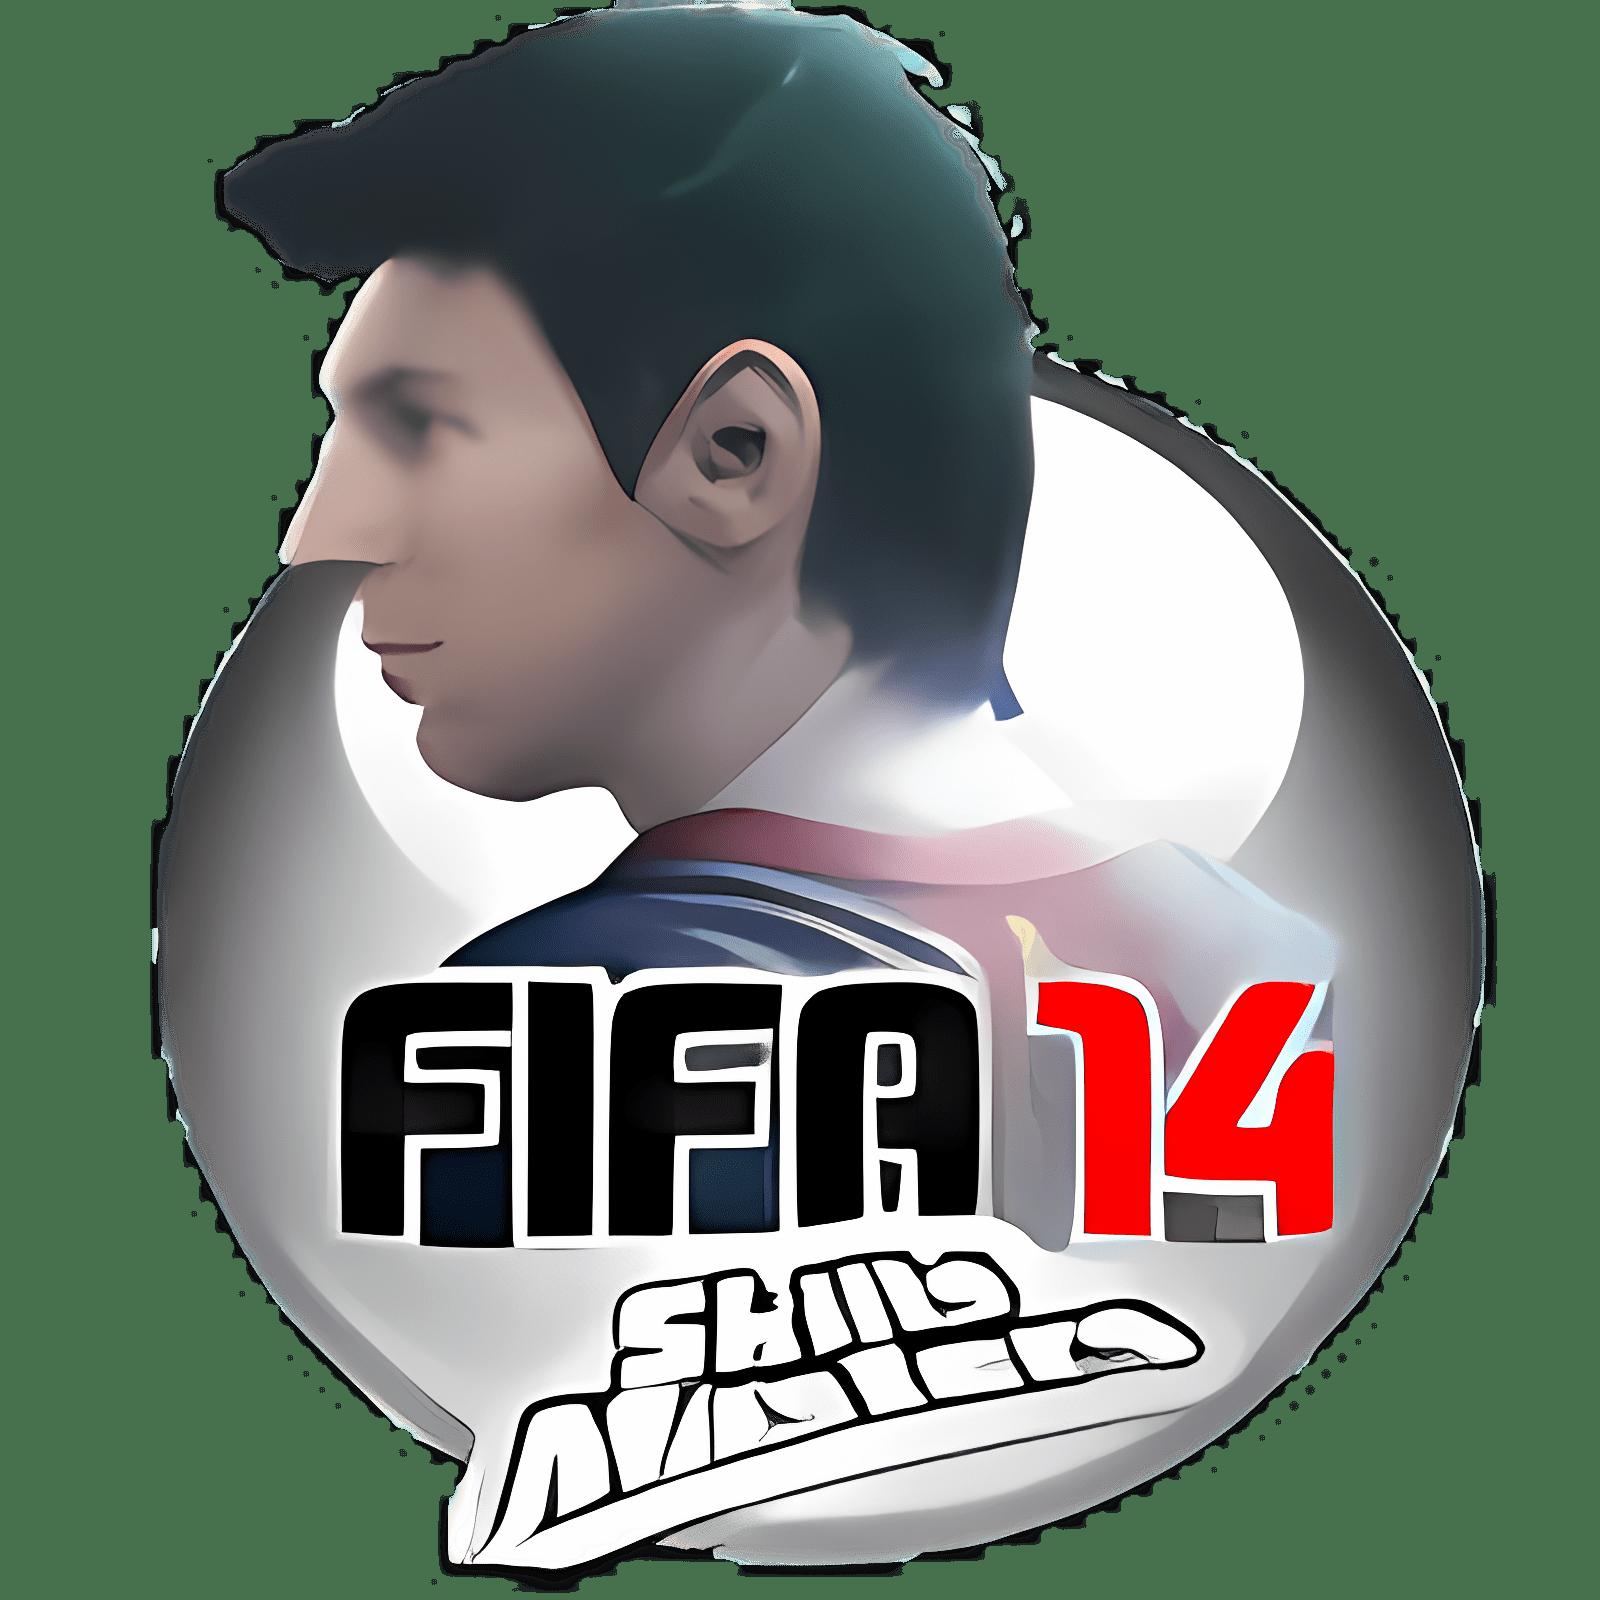 FIFA 14 Skills Master 1.01